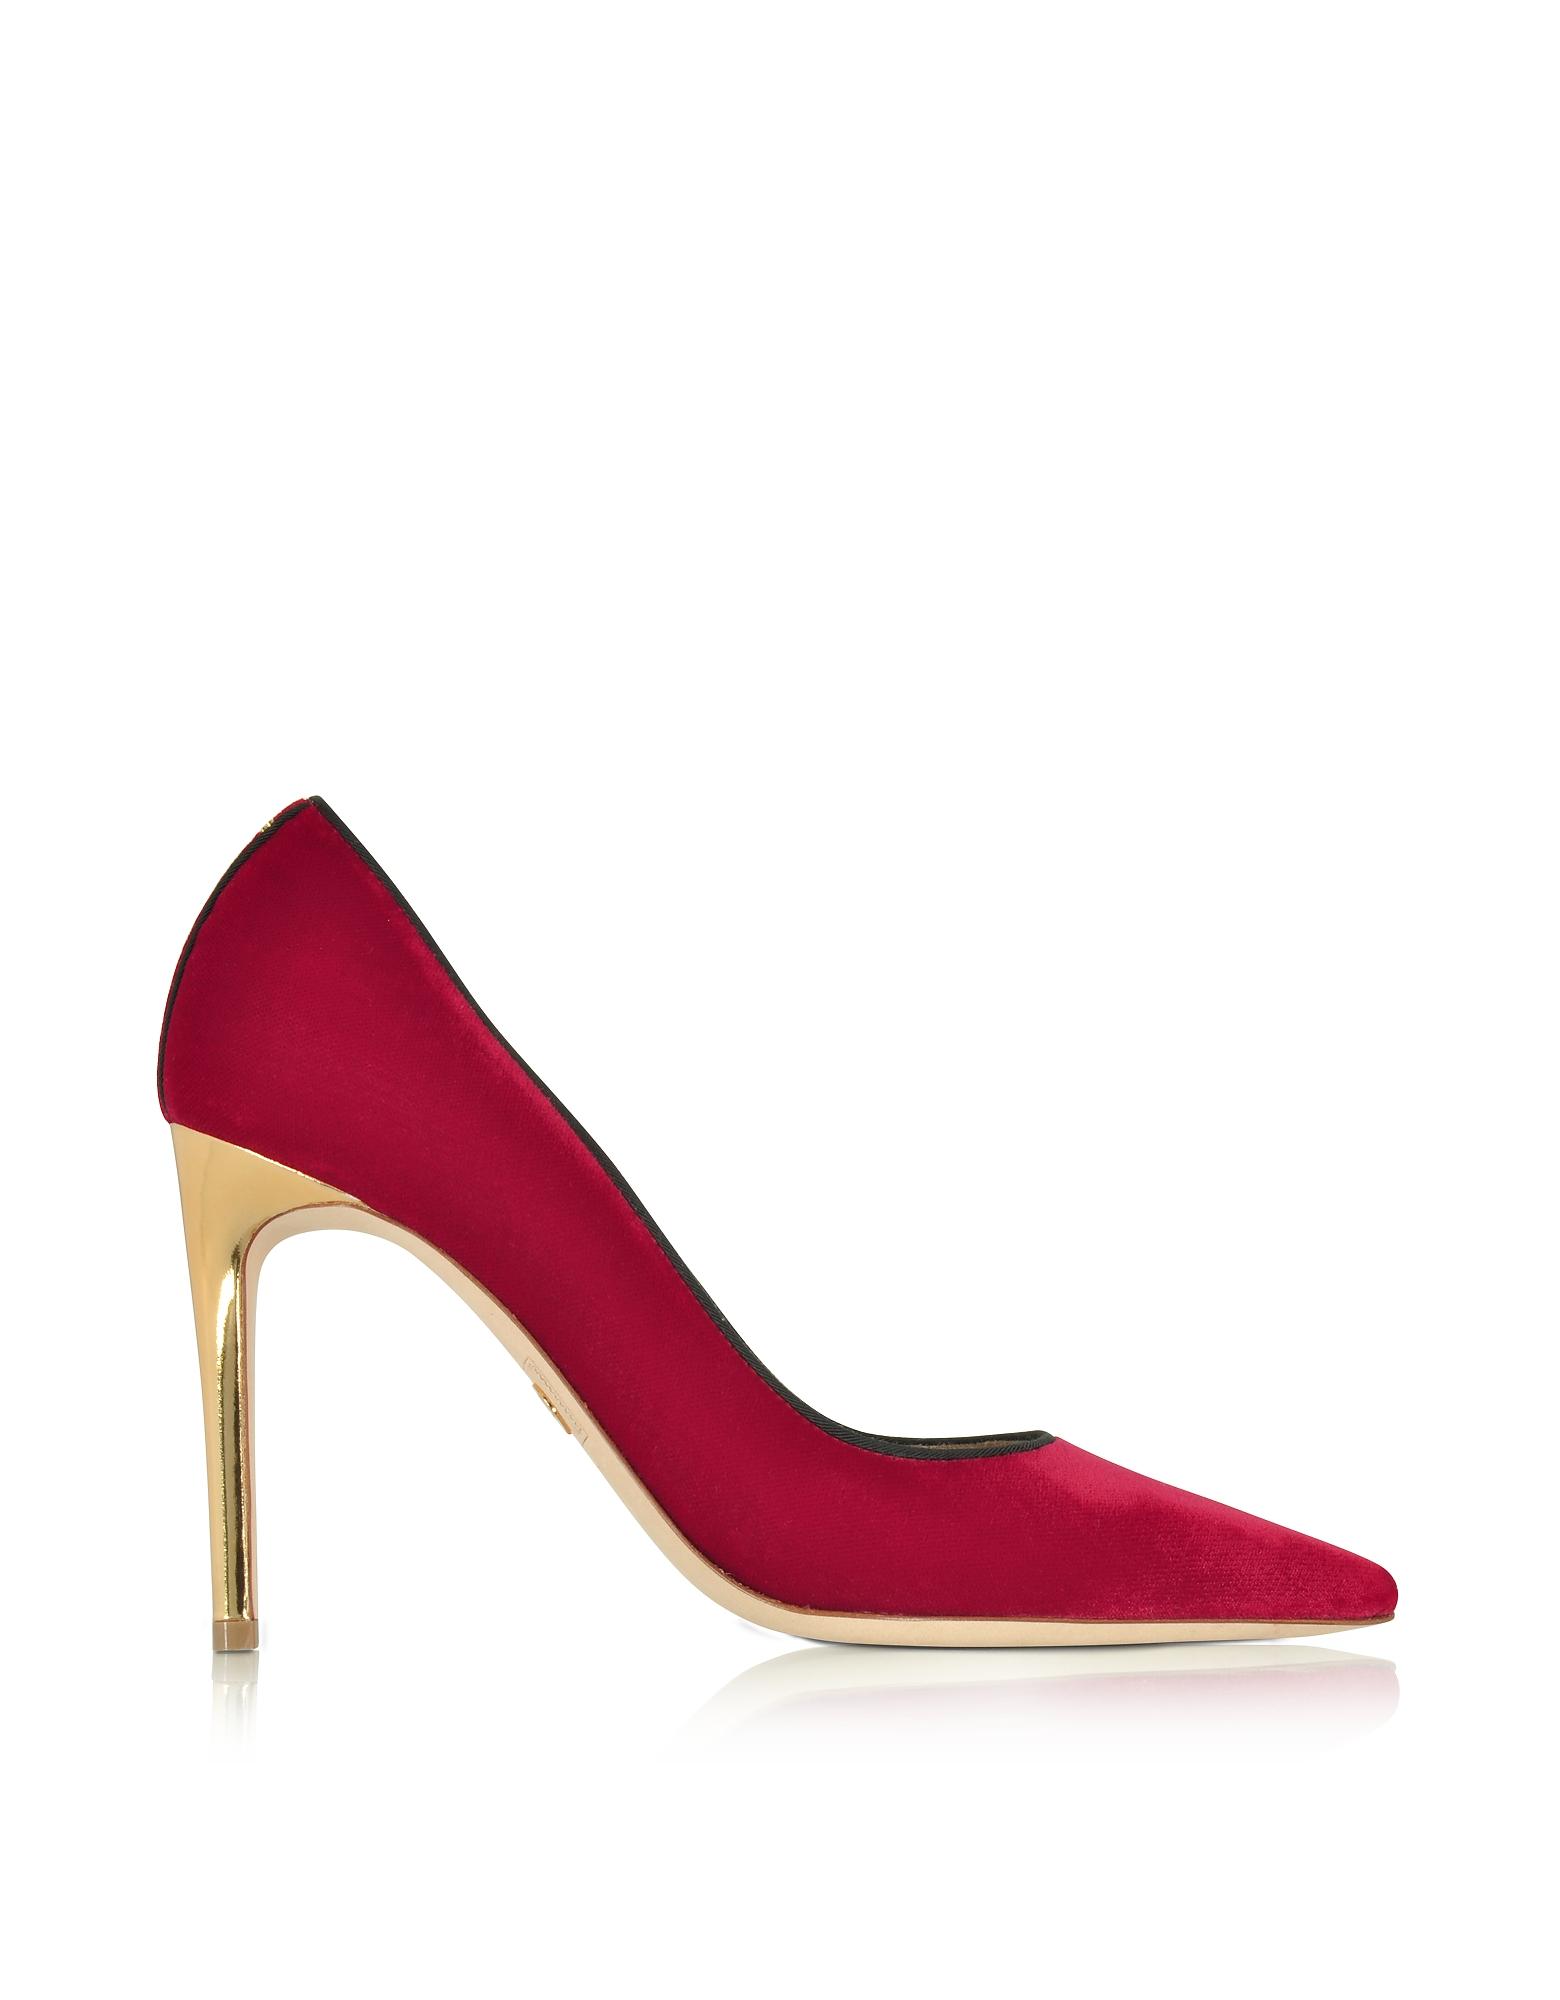 DSquared2 Shoes, Red Velvet Pump